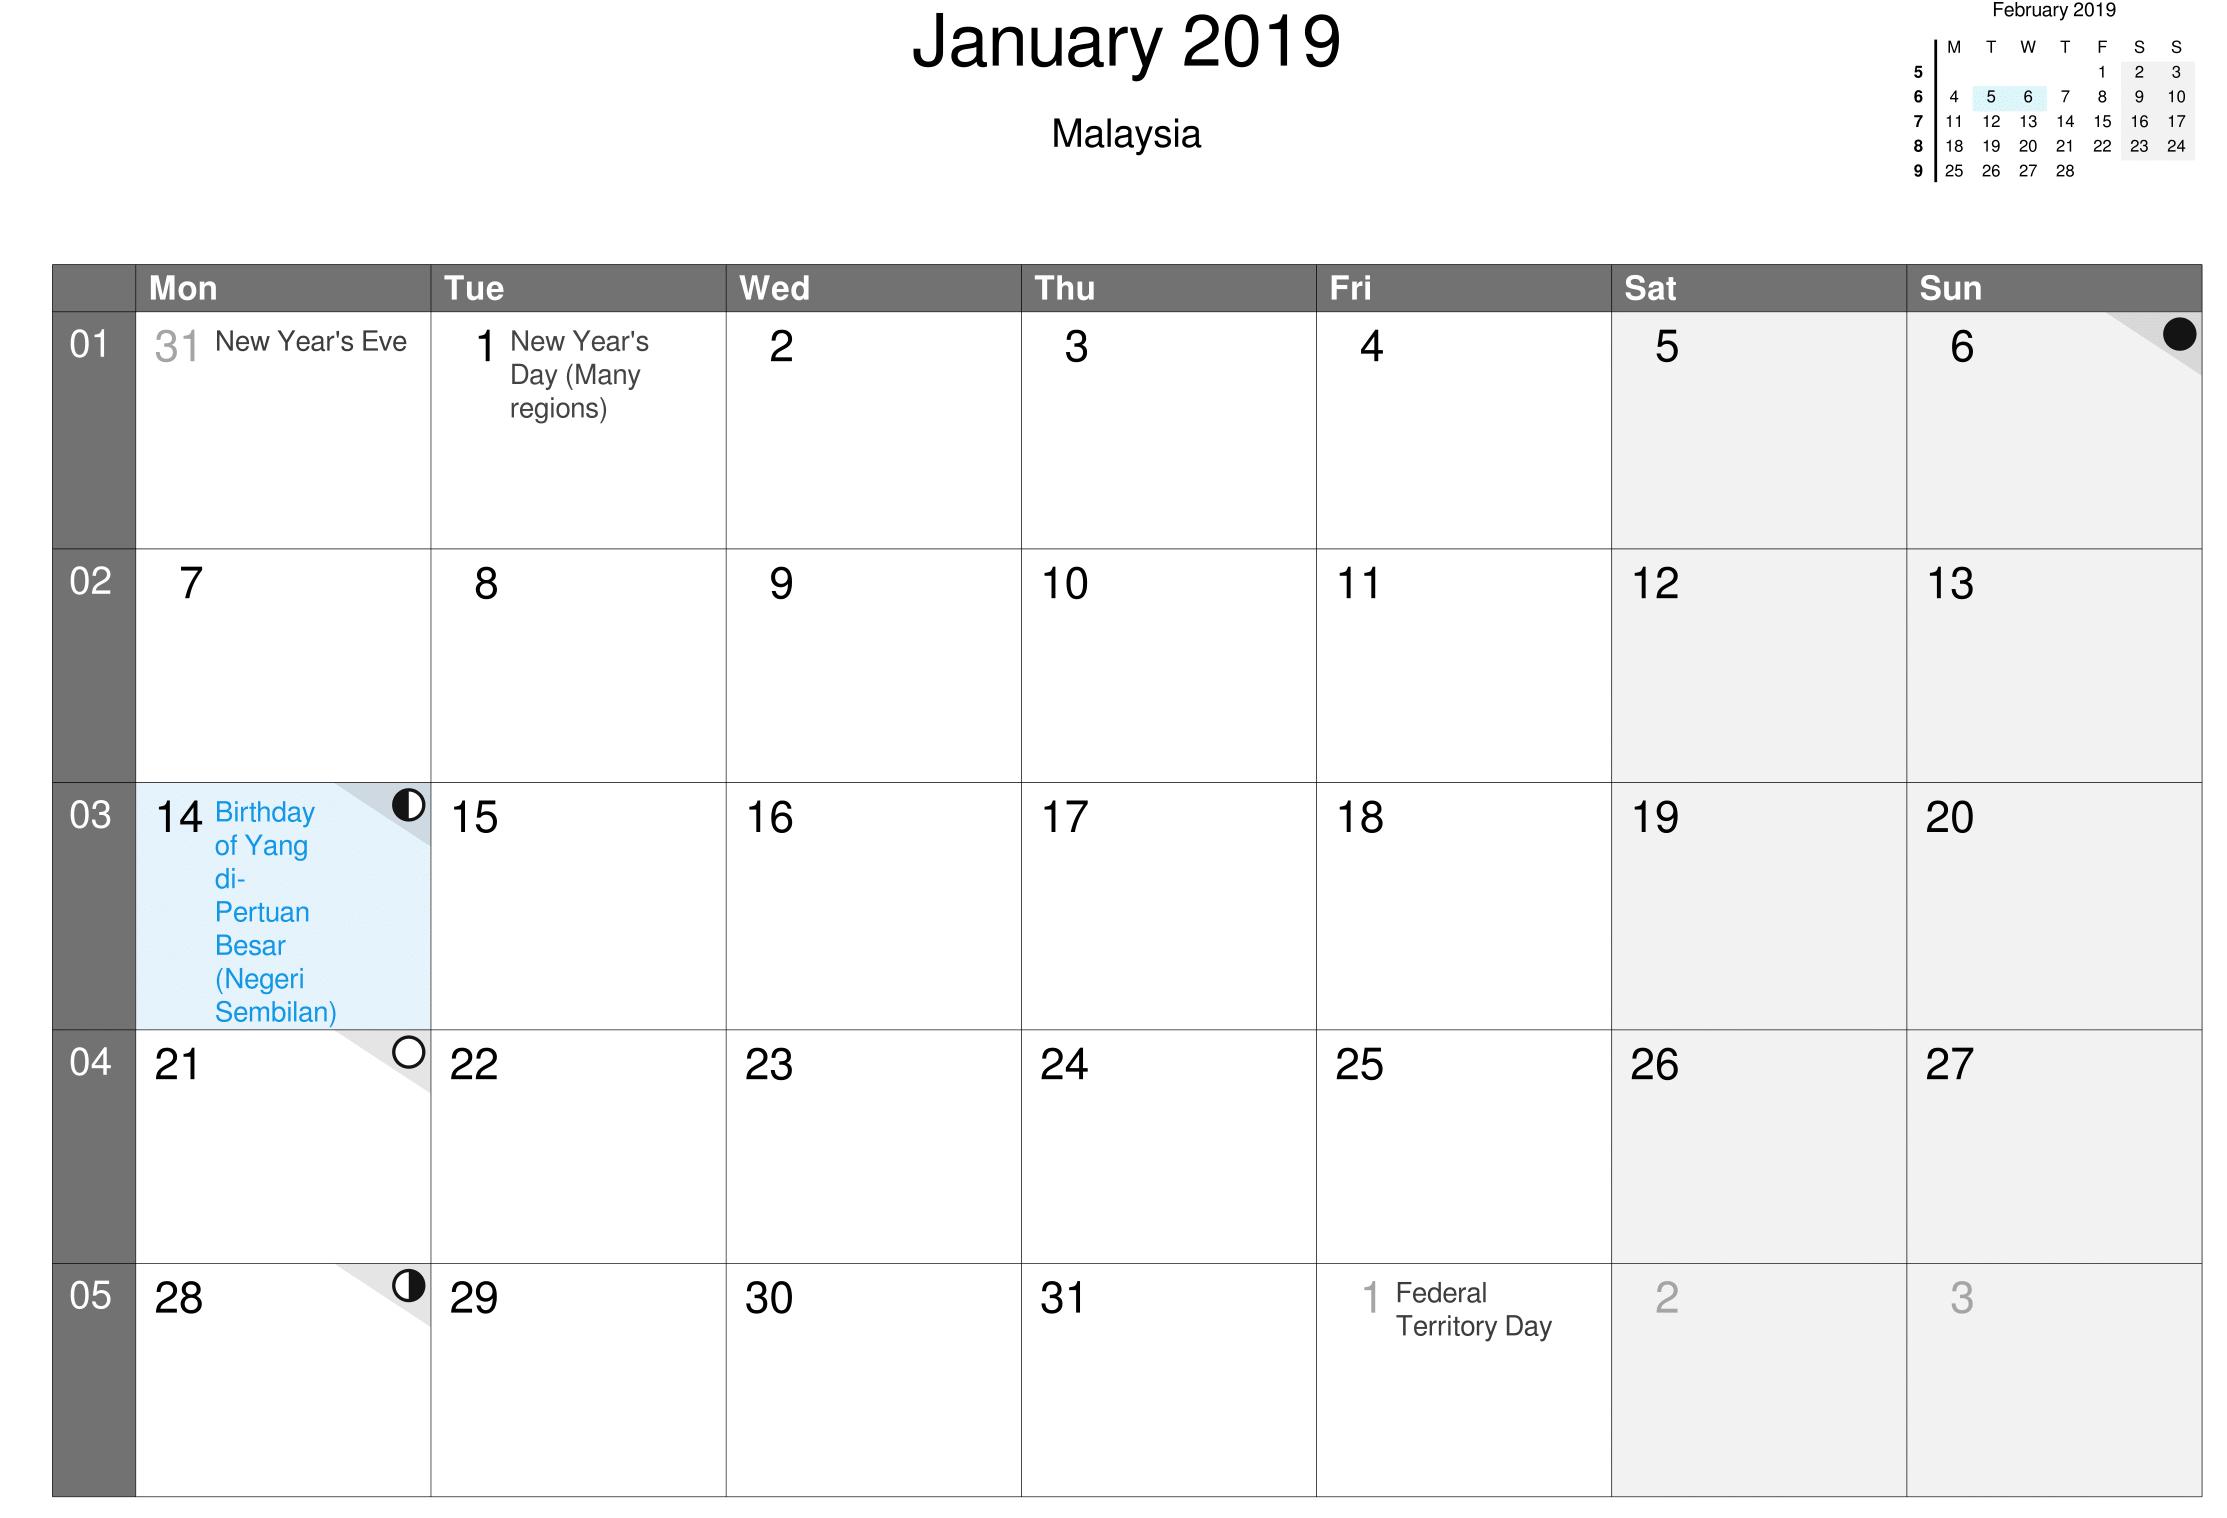 10+ January 2019 Calendar Template ideas | calendar template, calendar 2019  template, january calendar